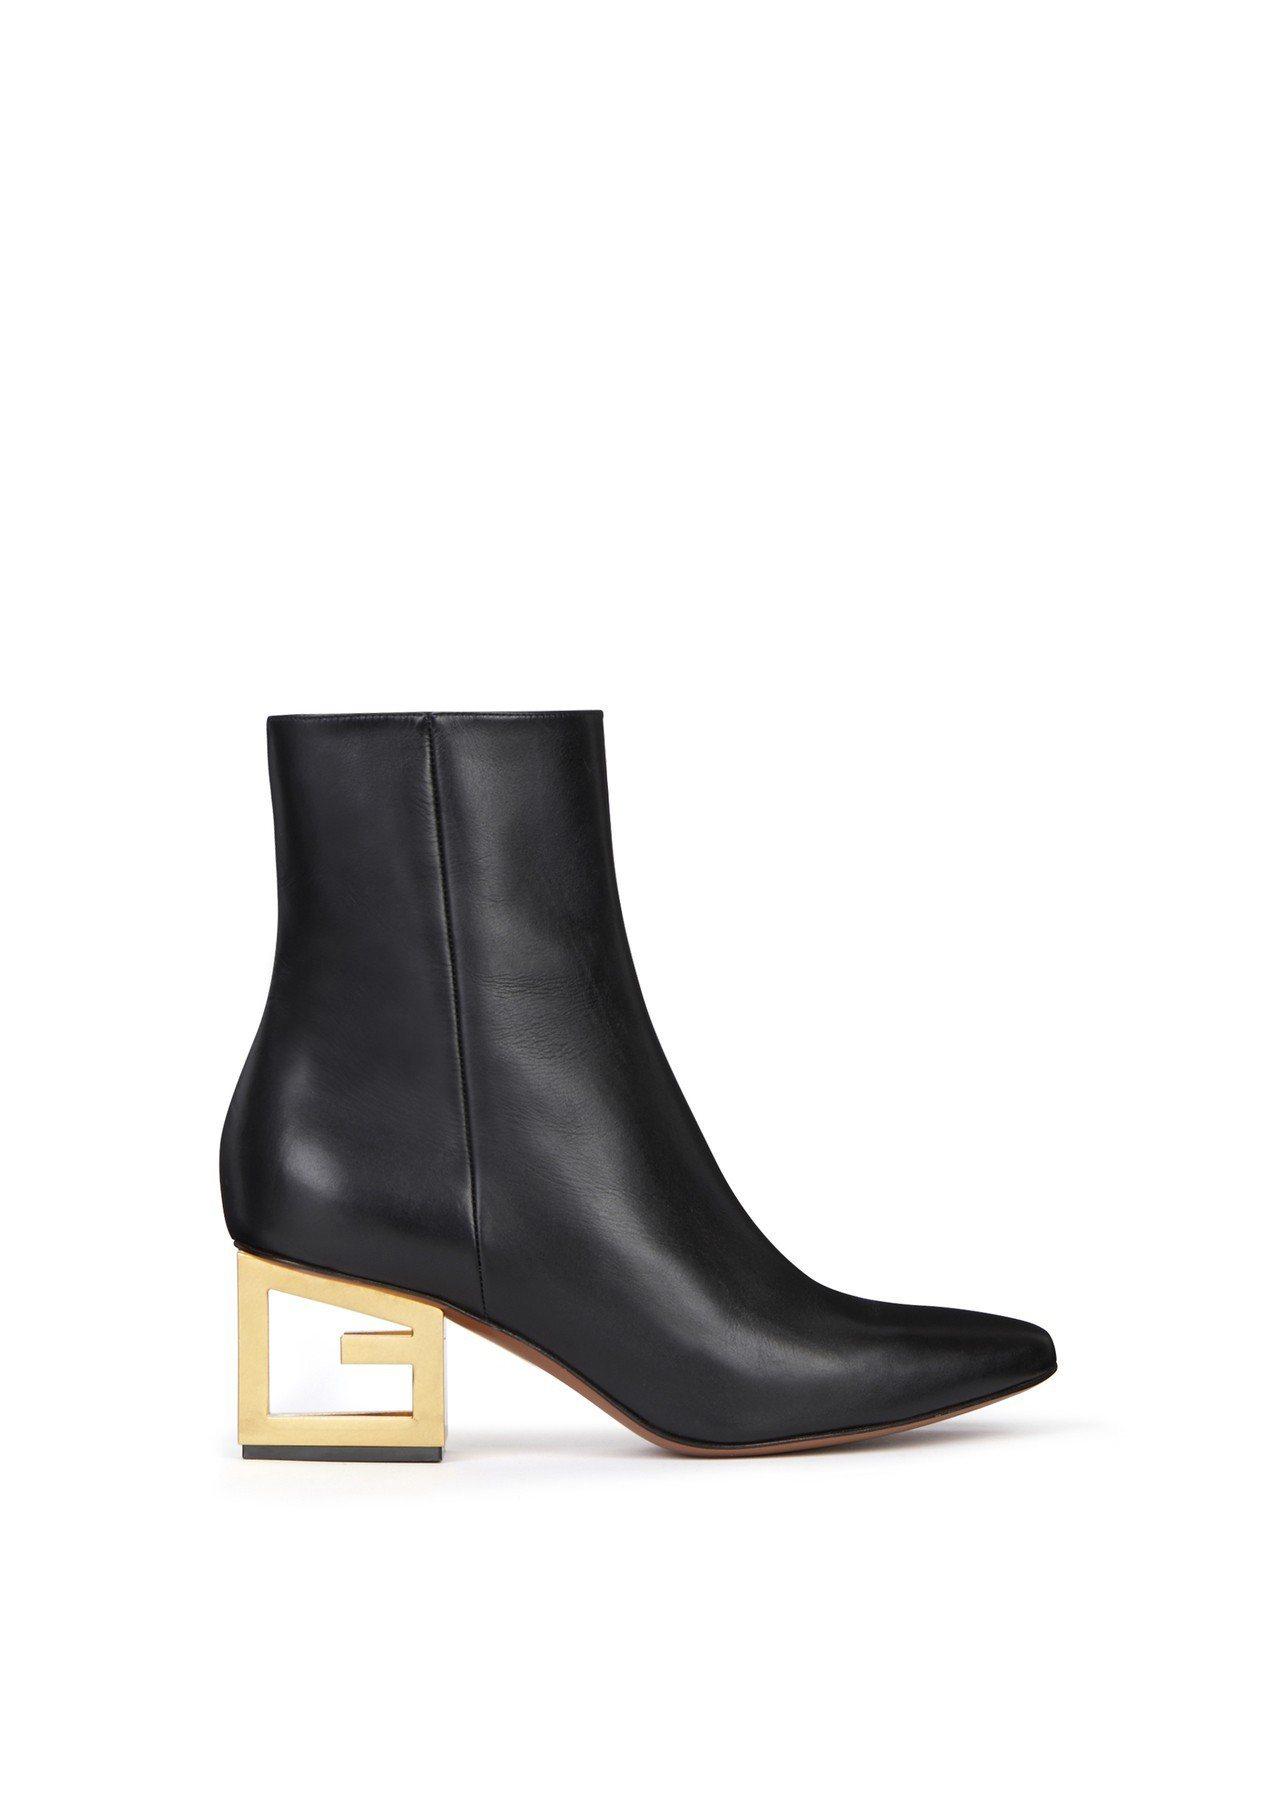 短靴,售價48,500元。圖/GIVENCHY提供